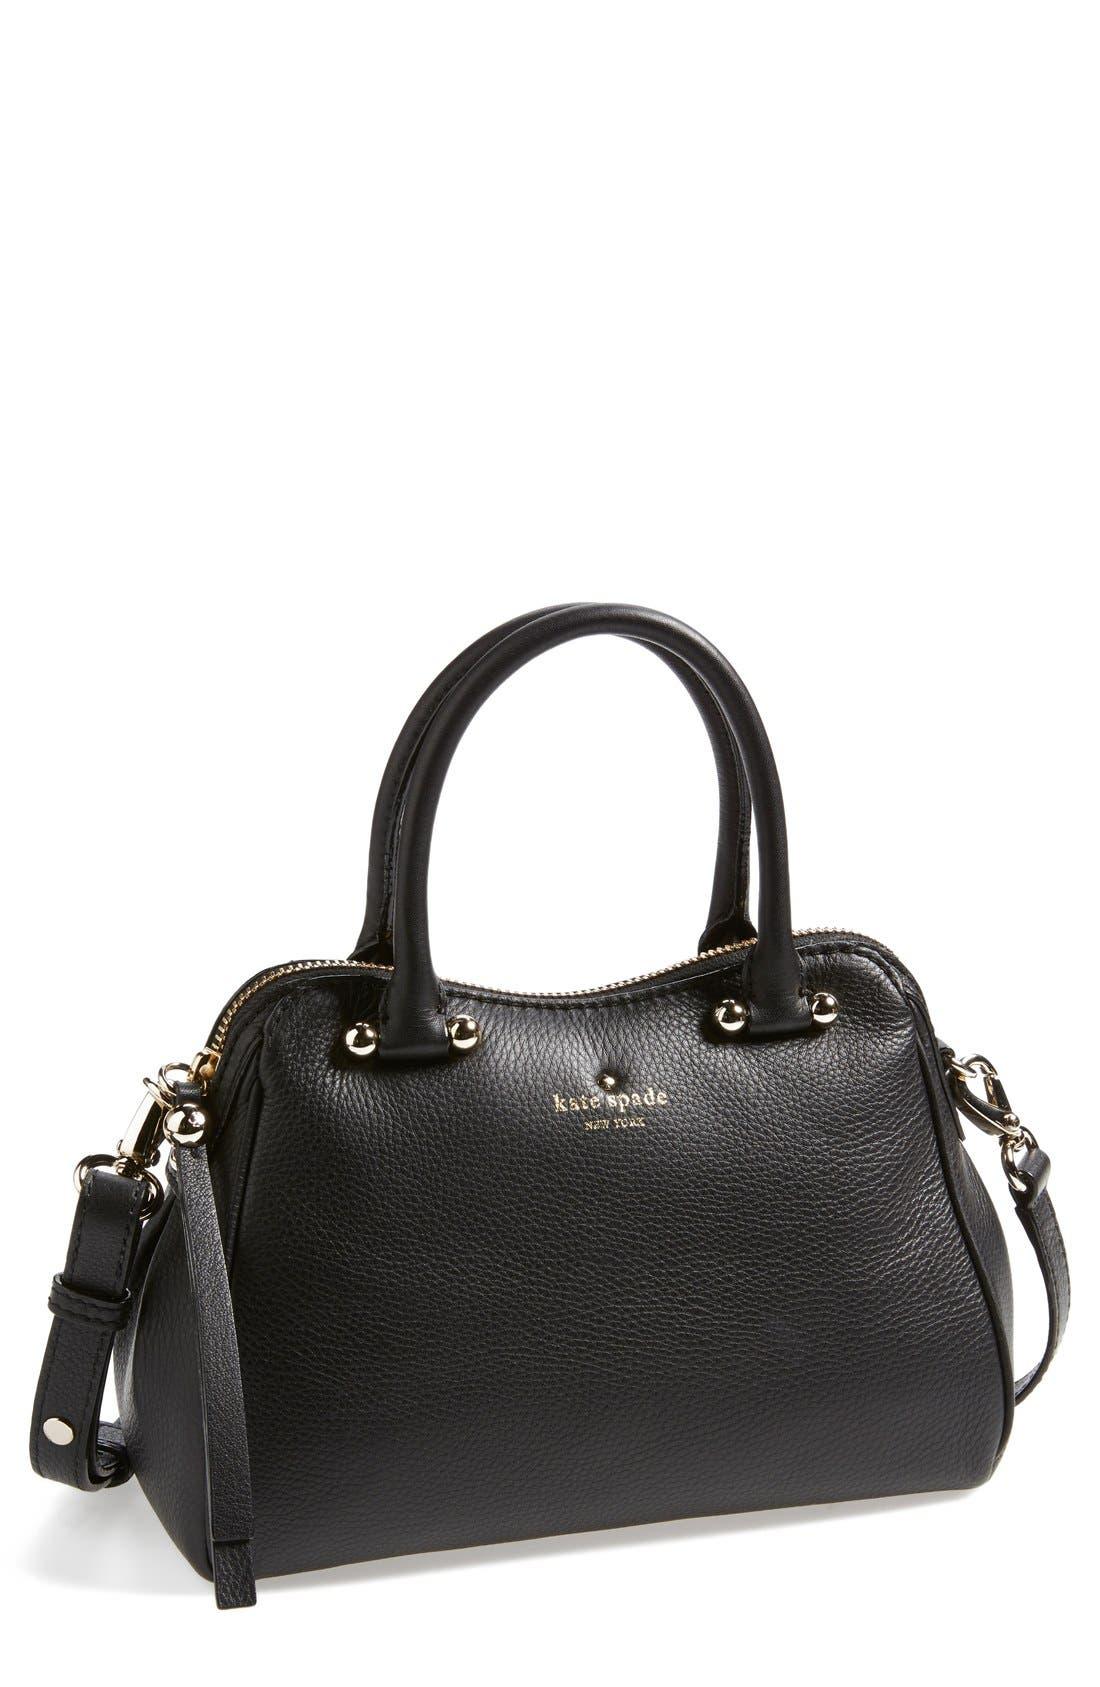 Alternate Image 1 Selected - kate spade new york 'charles street - mini audrey' leather satchel